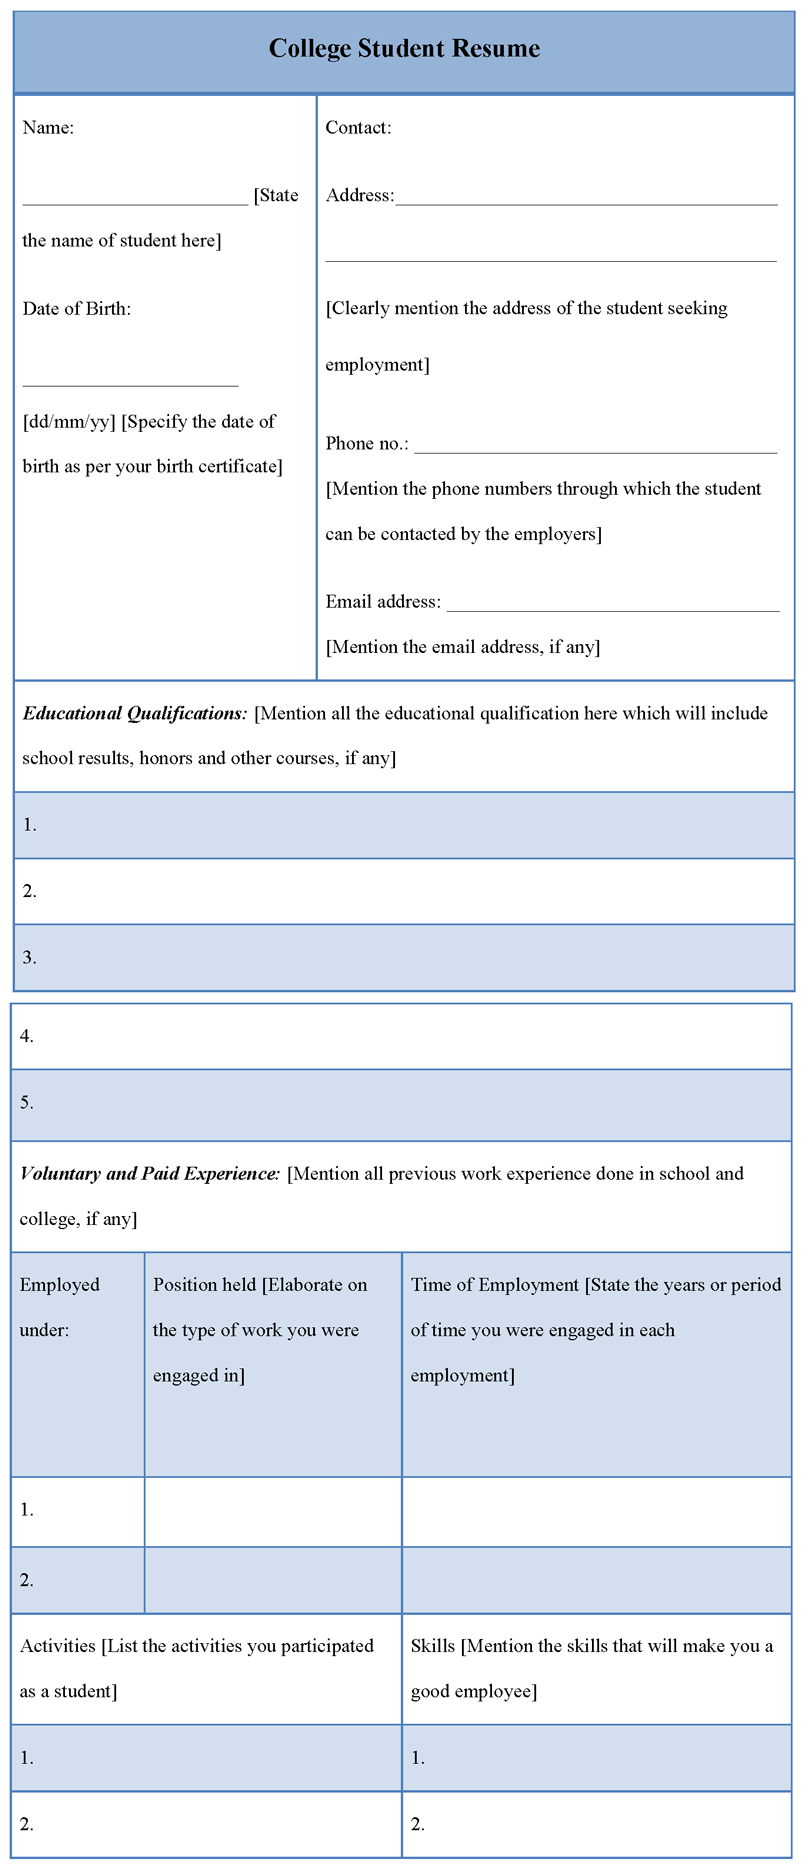 college student resume examples resume builder resume templates httpwwwjobresume - Student Resume Builder Free